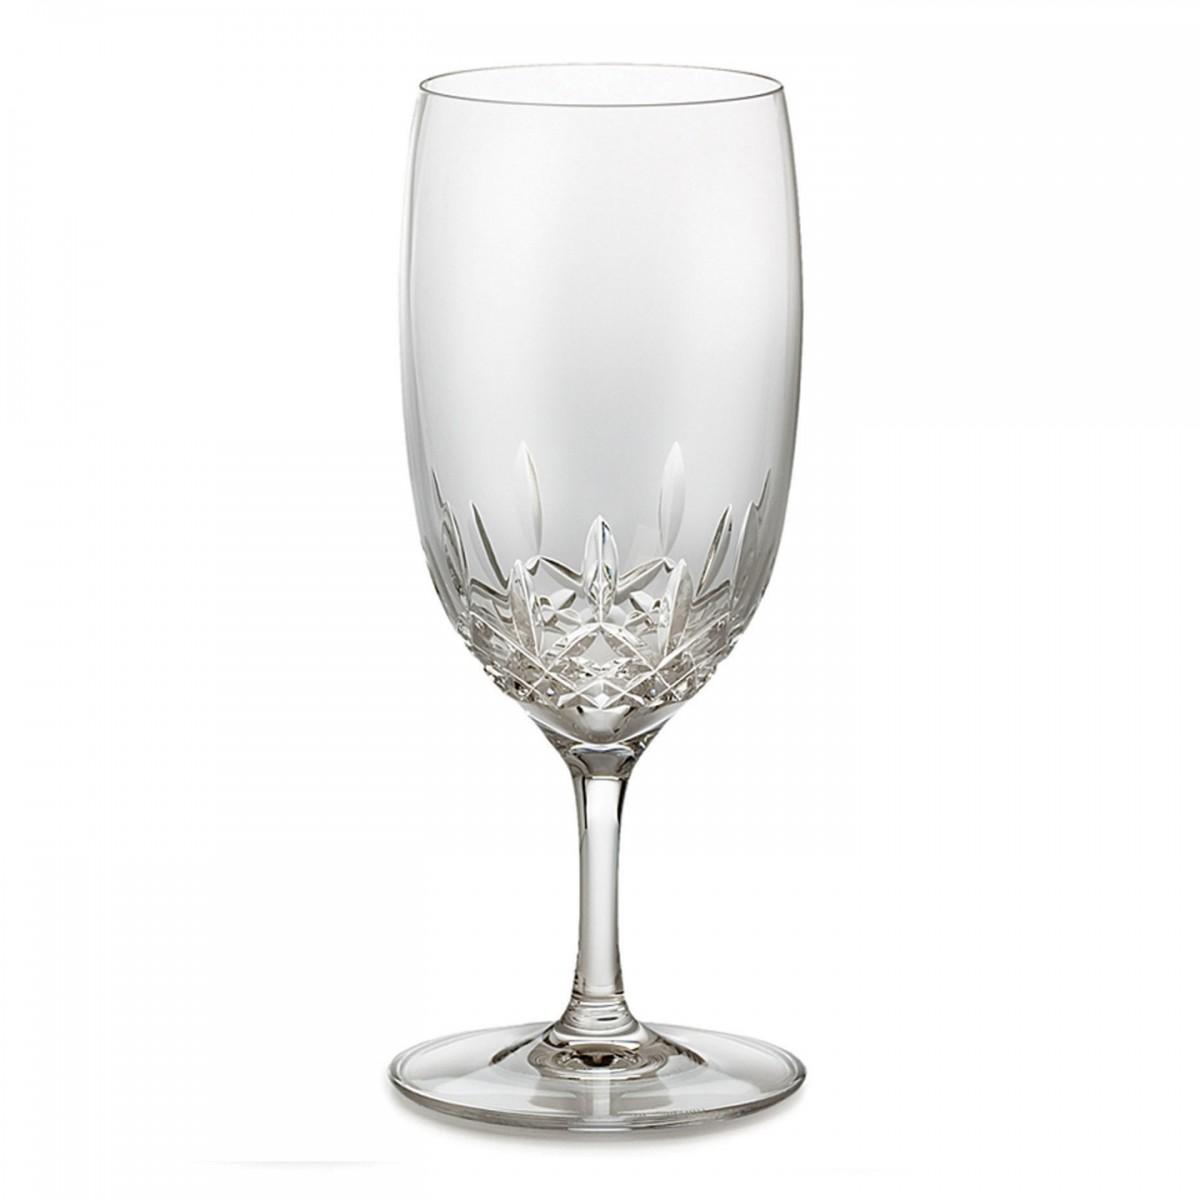 waterford-lismore-essence-water-glass-024258415096.jpg